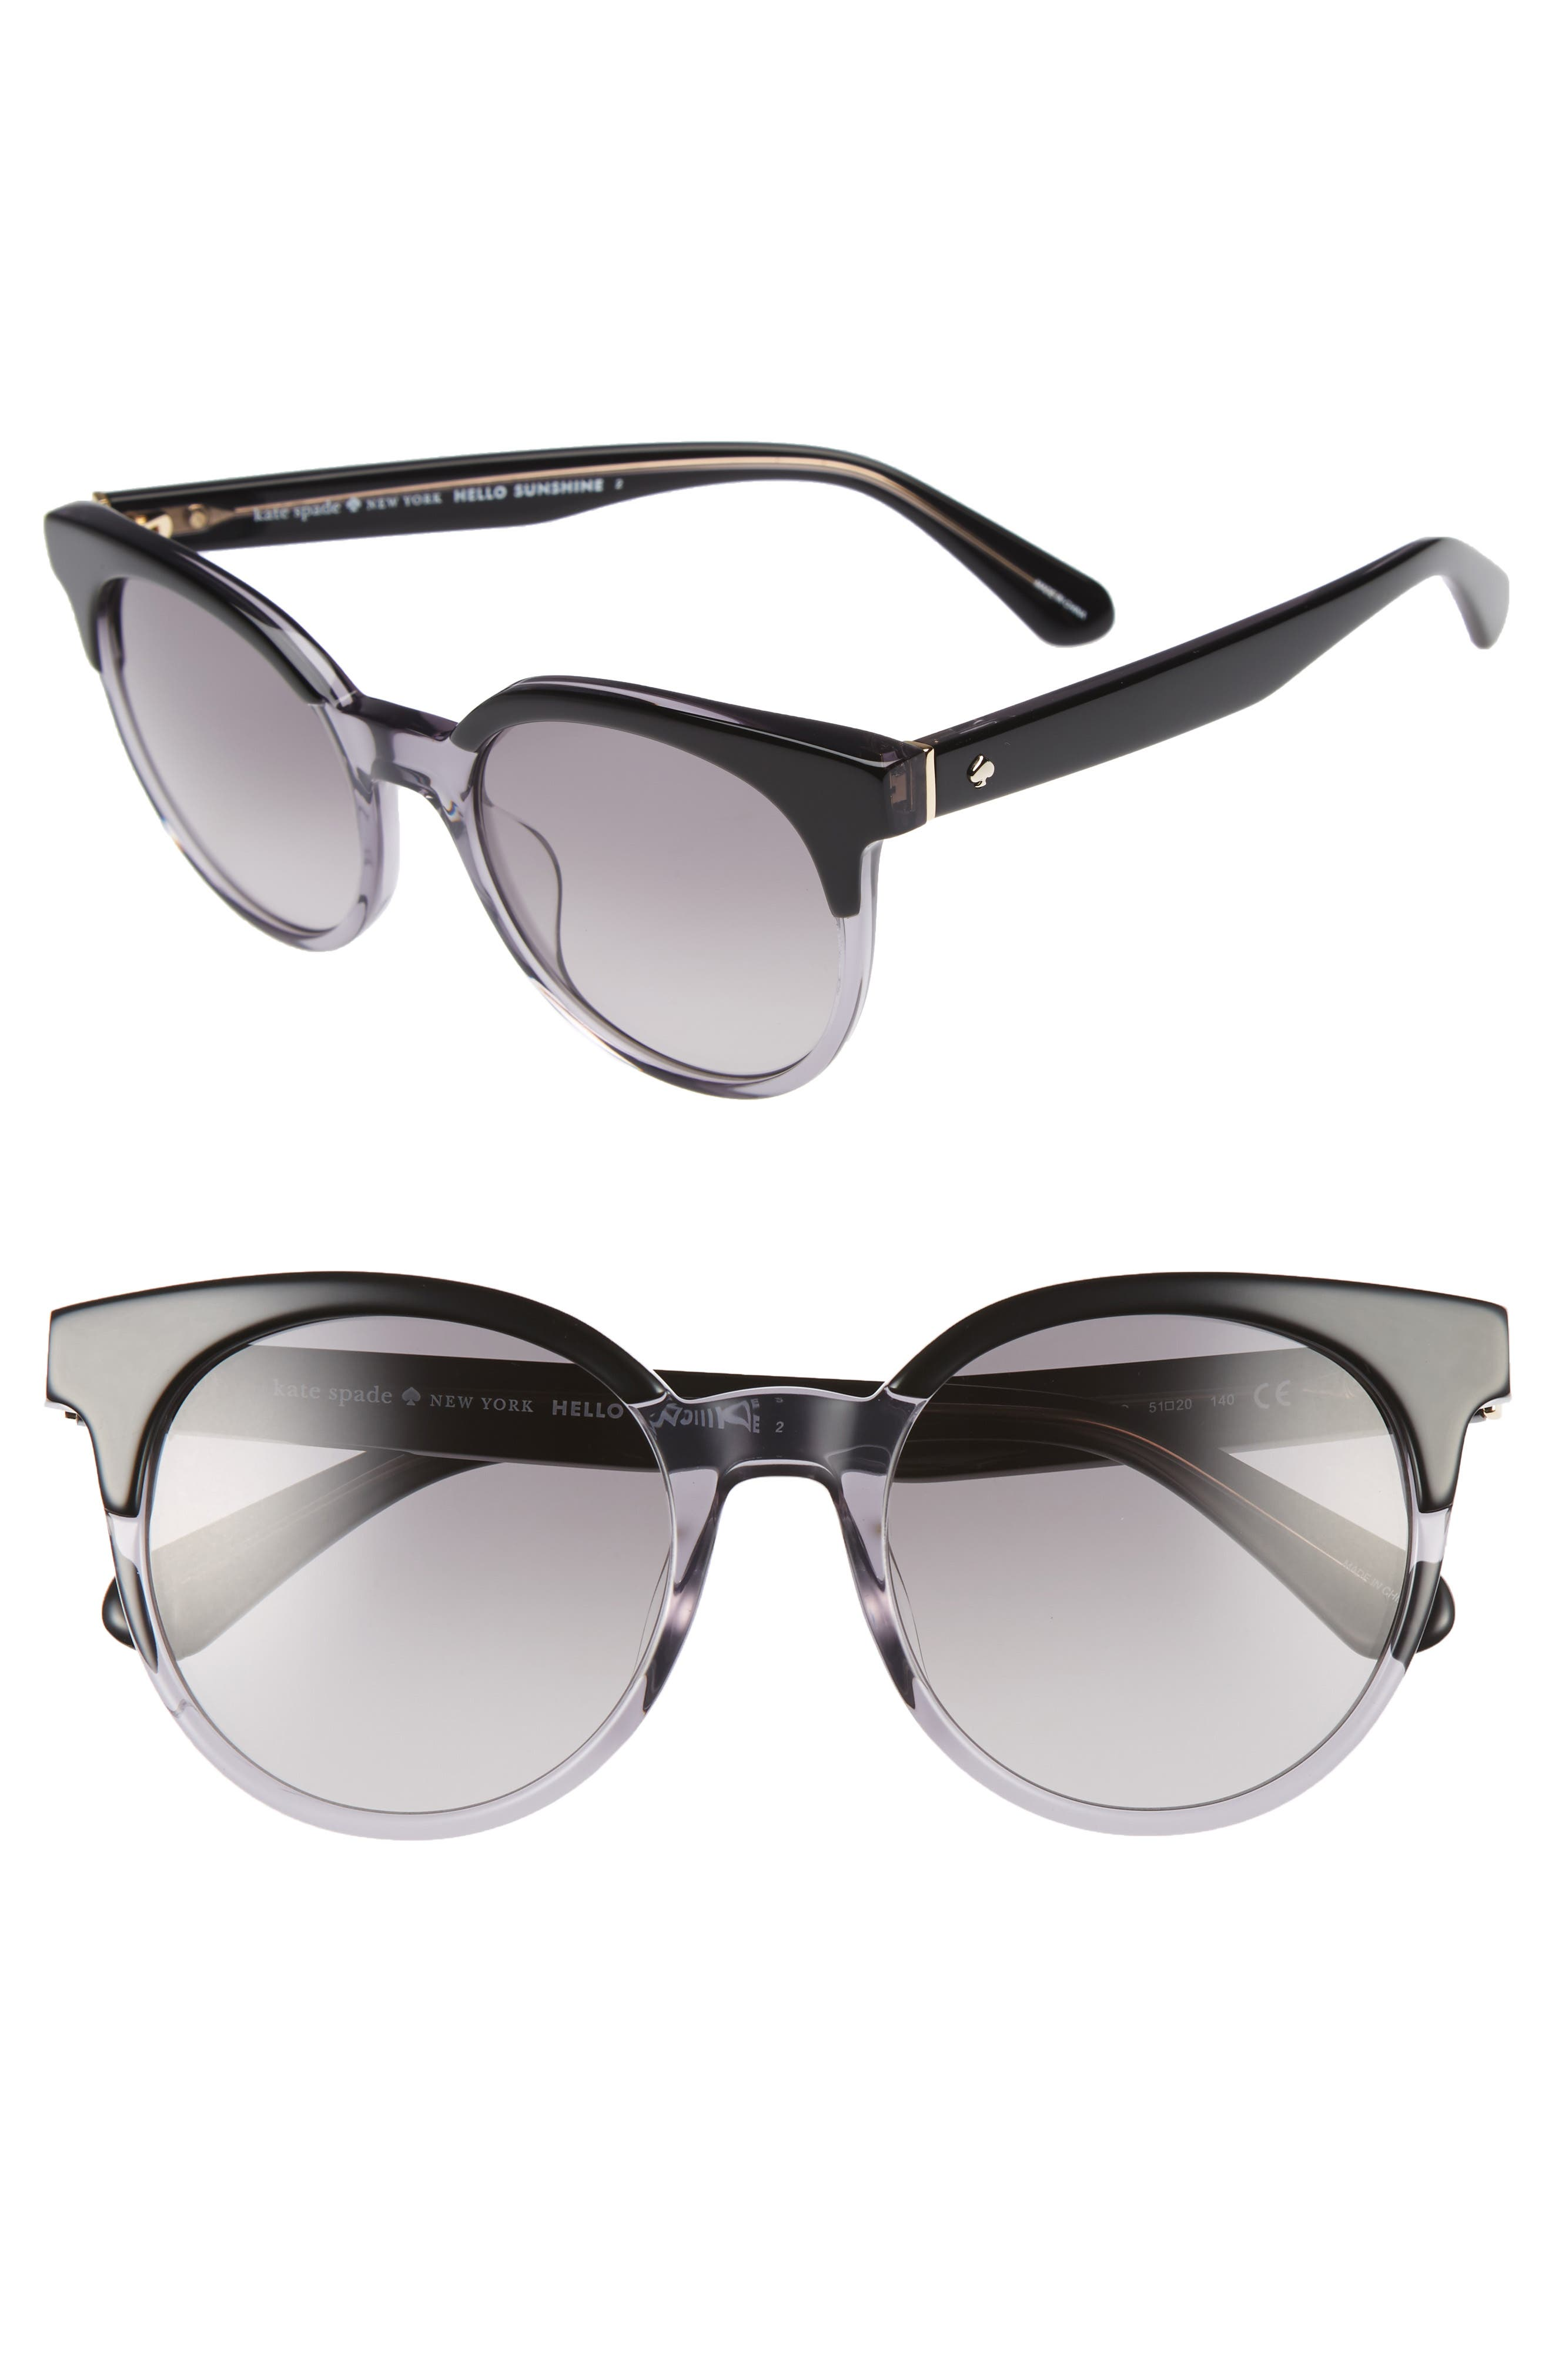 Main Image - kate spade new york abianne 51mm round sunglasses